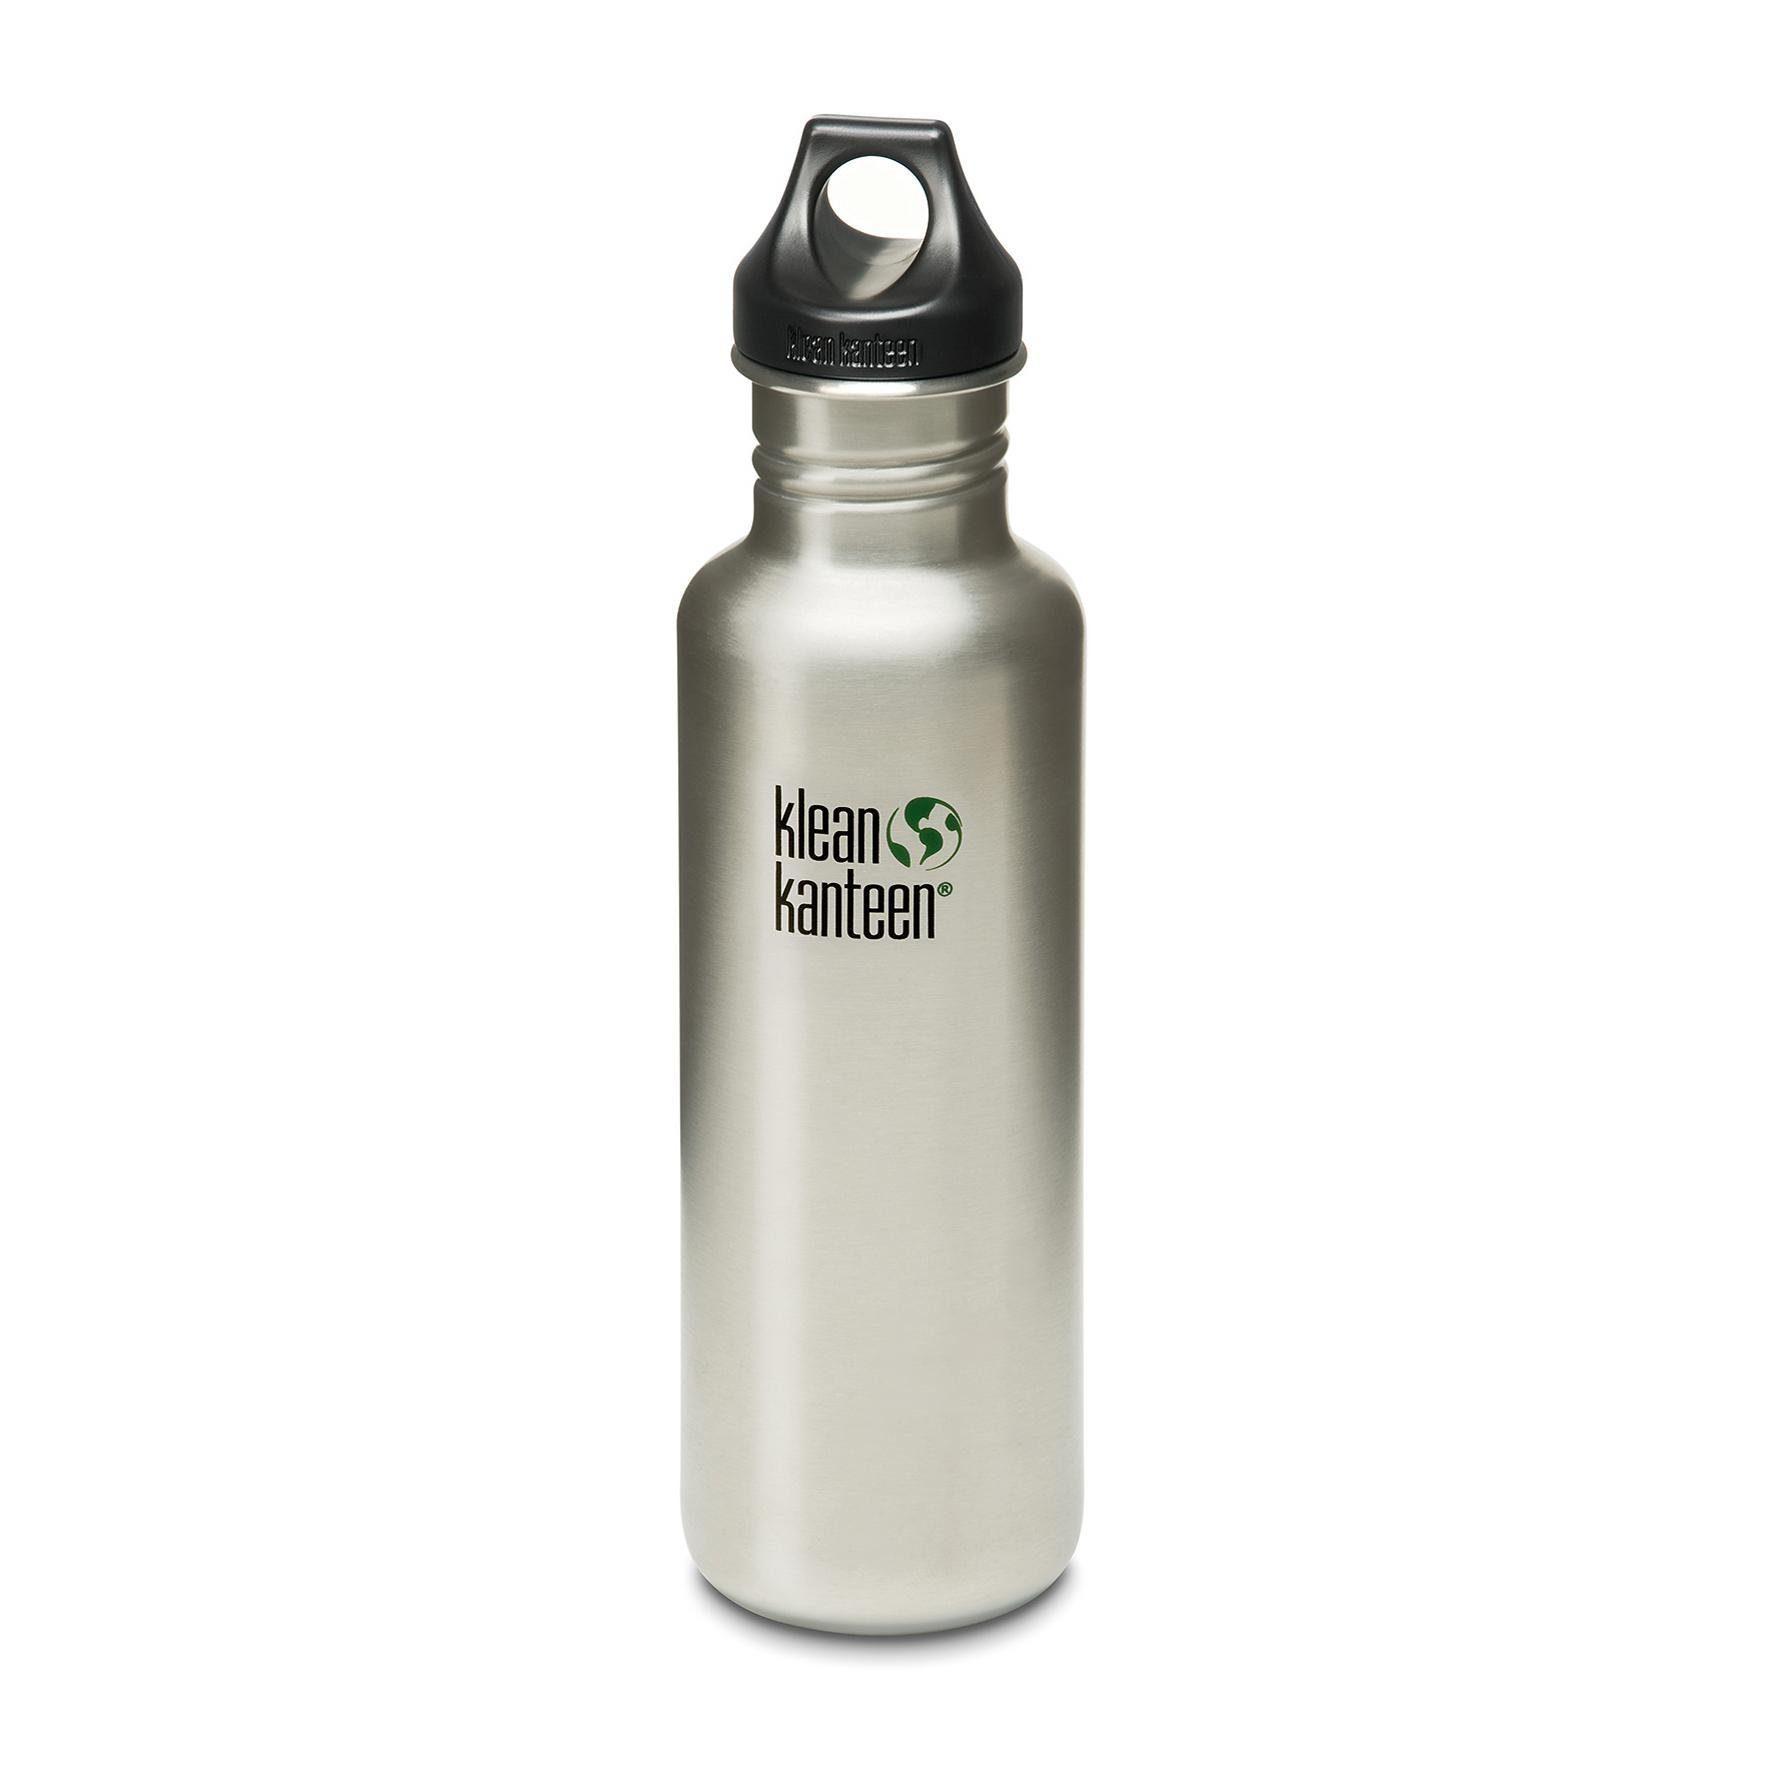 Klean Kanteen Trinkflasche »Classic Trinkflasche mit Loop Cap 800ml«